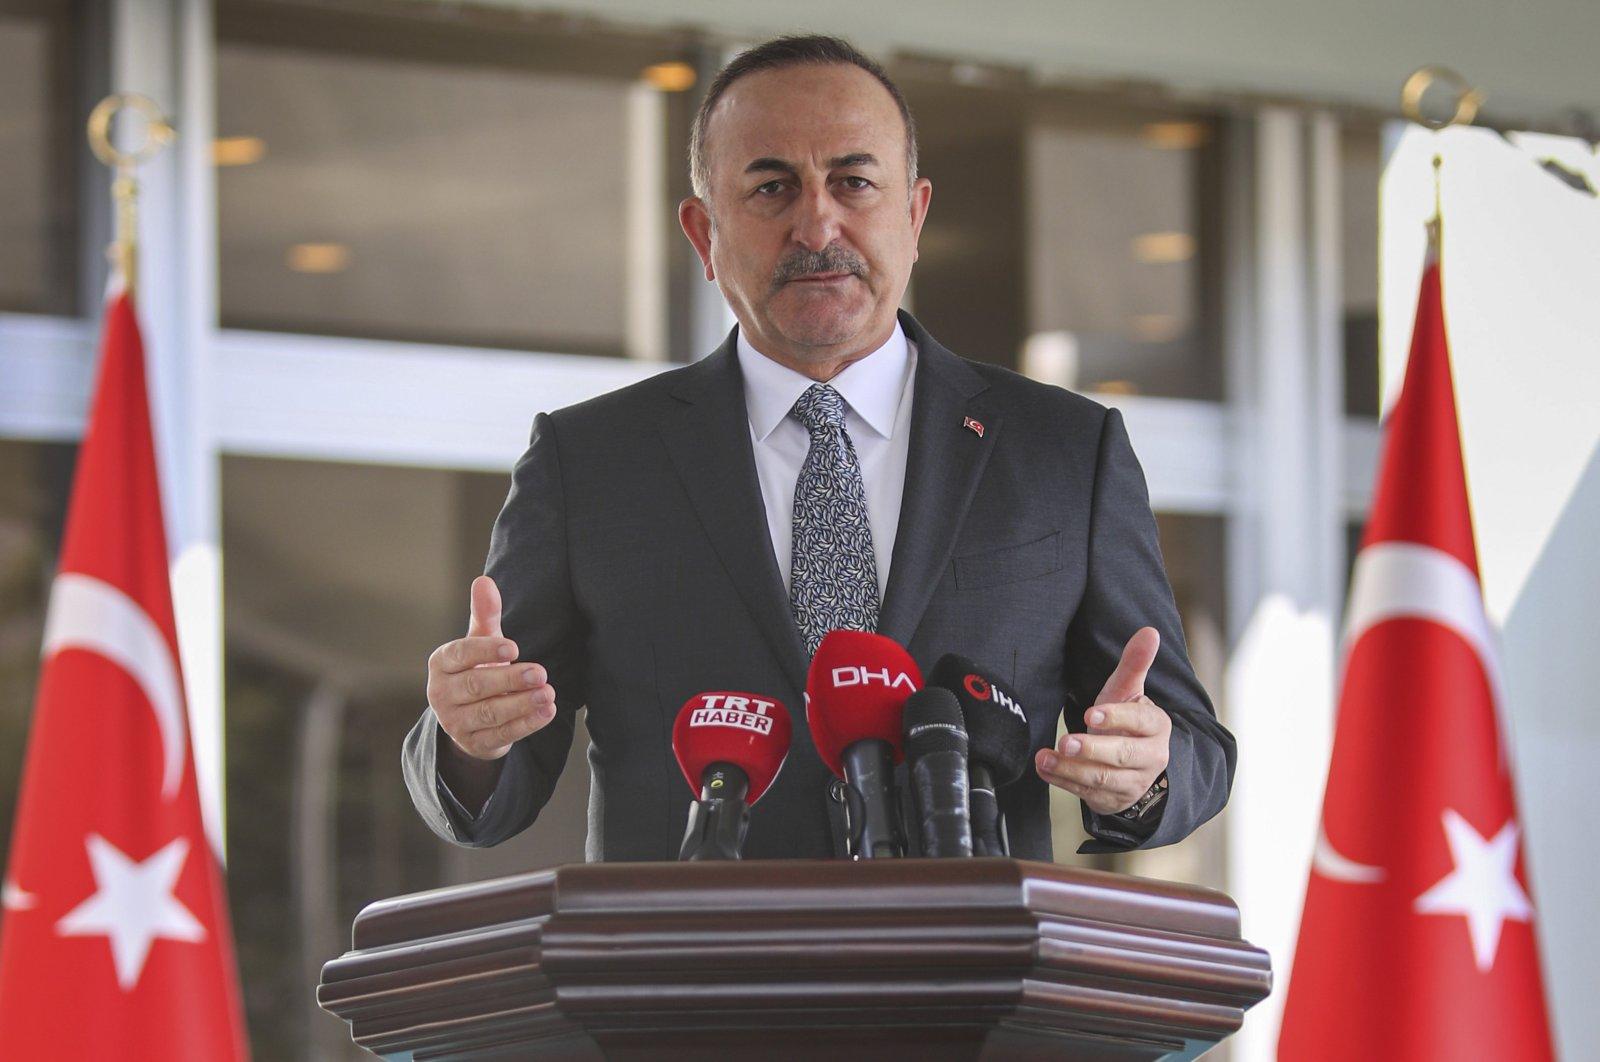 Foreign Minister Mevlüt Çavuşoğlu speaks to the media amid the coronavirus outbreak, in Ankara, Turkey, March 25, 2020. (AP Photo)